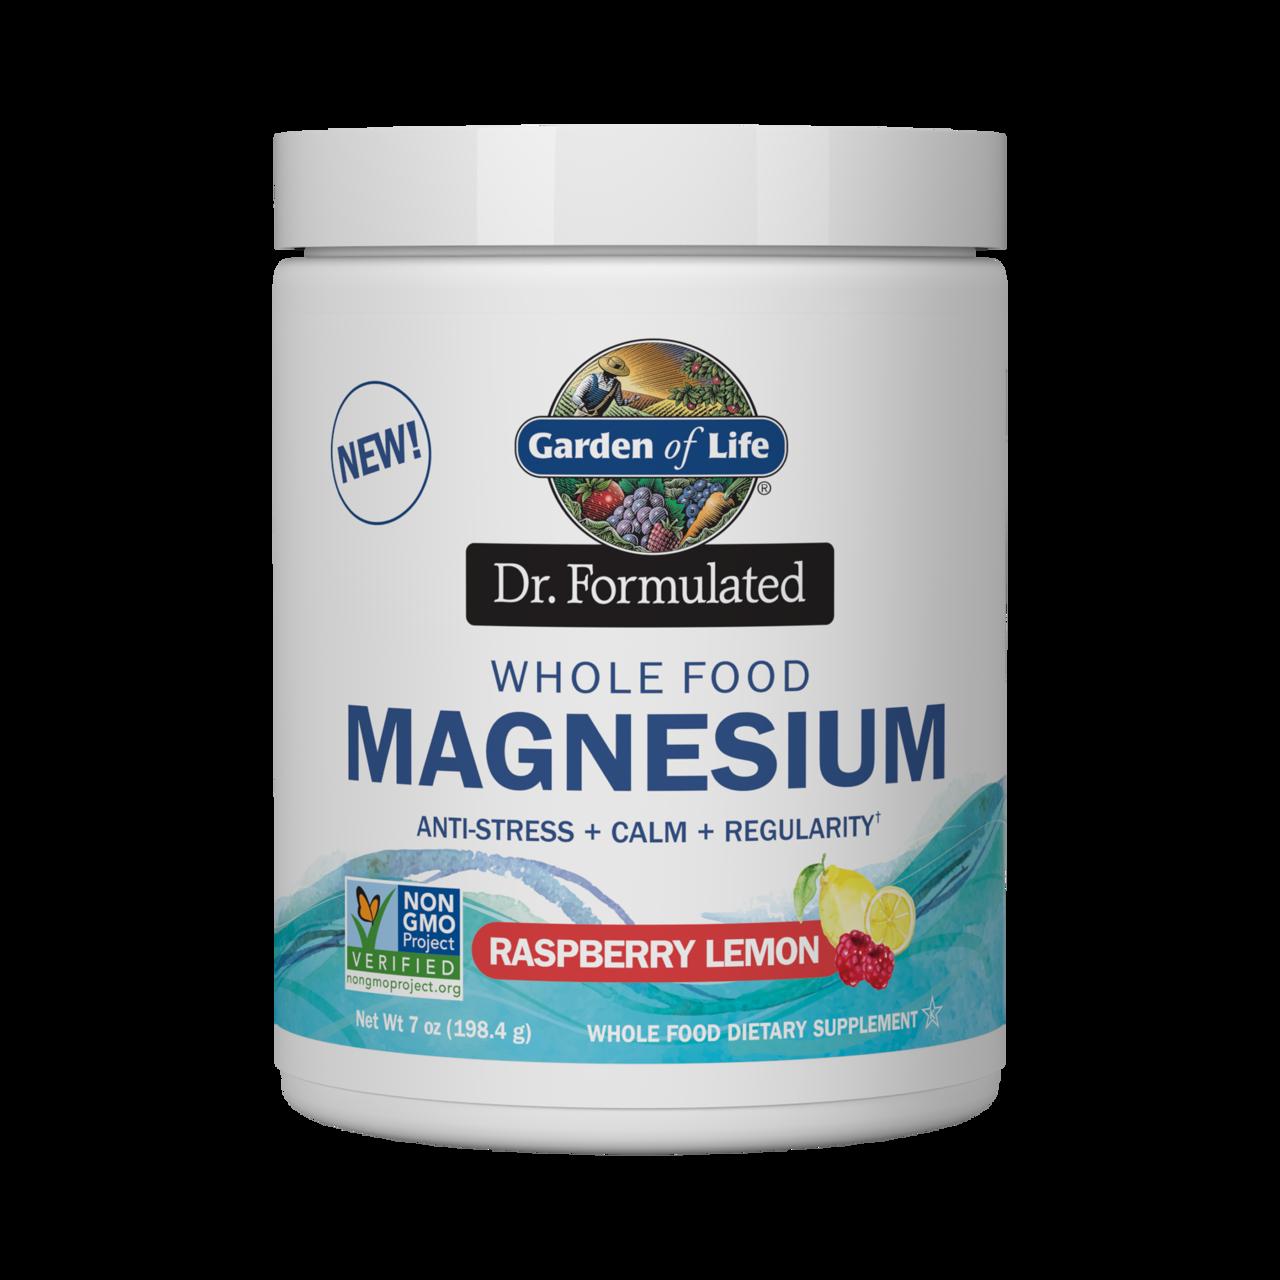 Garden of Life - Magnesium Dr. Formulated (hořčík) - malina a citrón, 198g